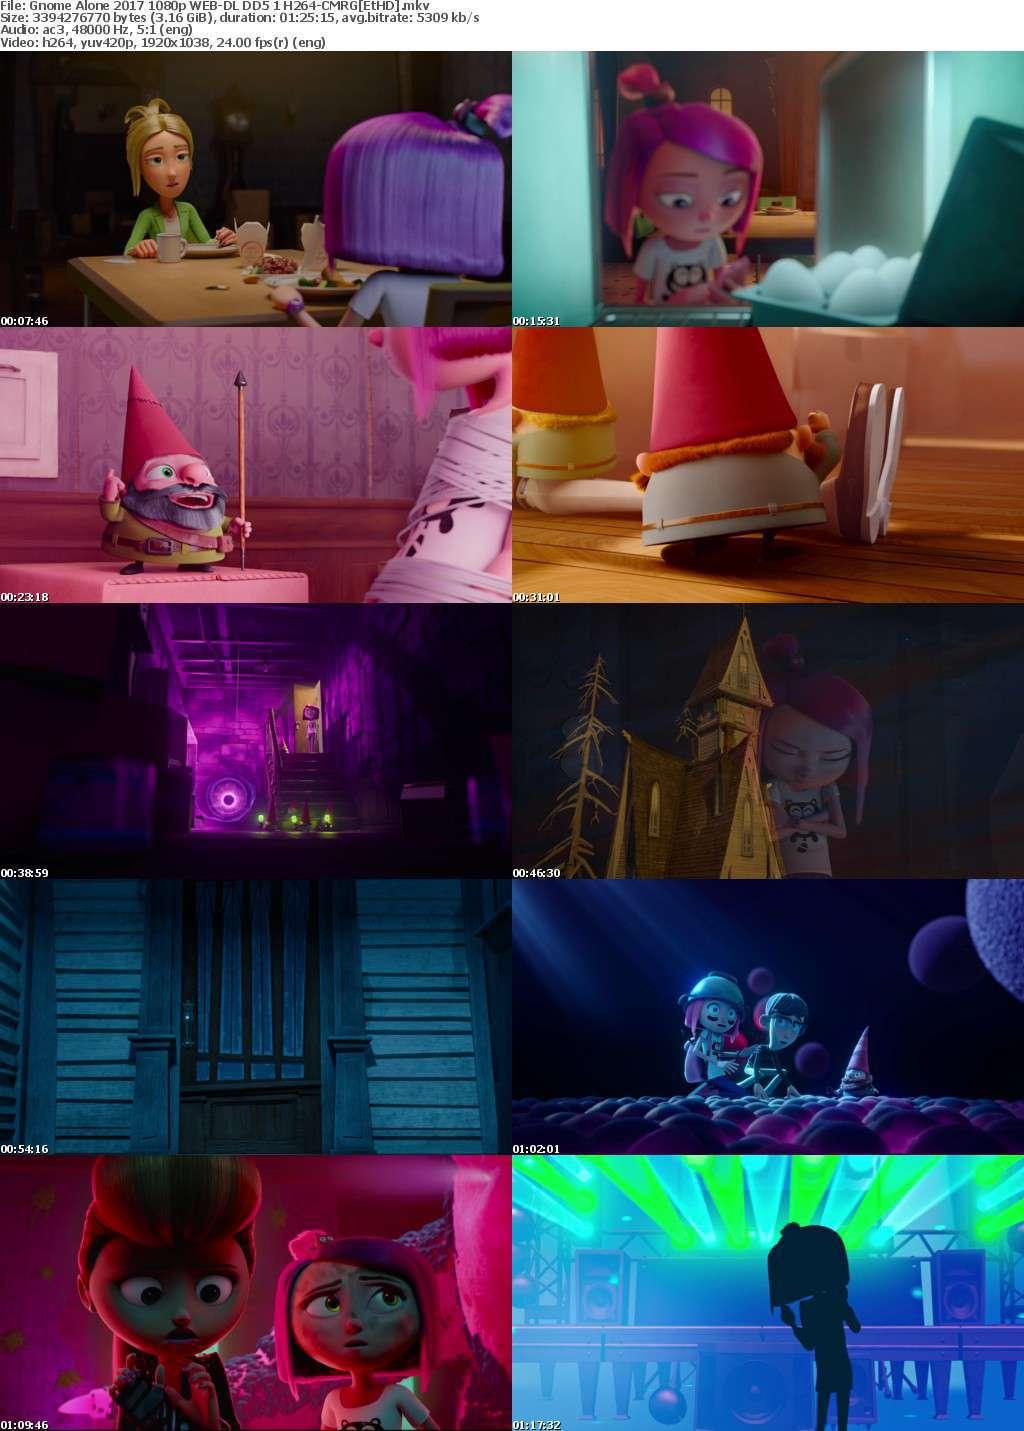 Gnome Alone (2017) 1080p WEB-DL DD5.1 H264-CMRG